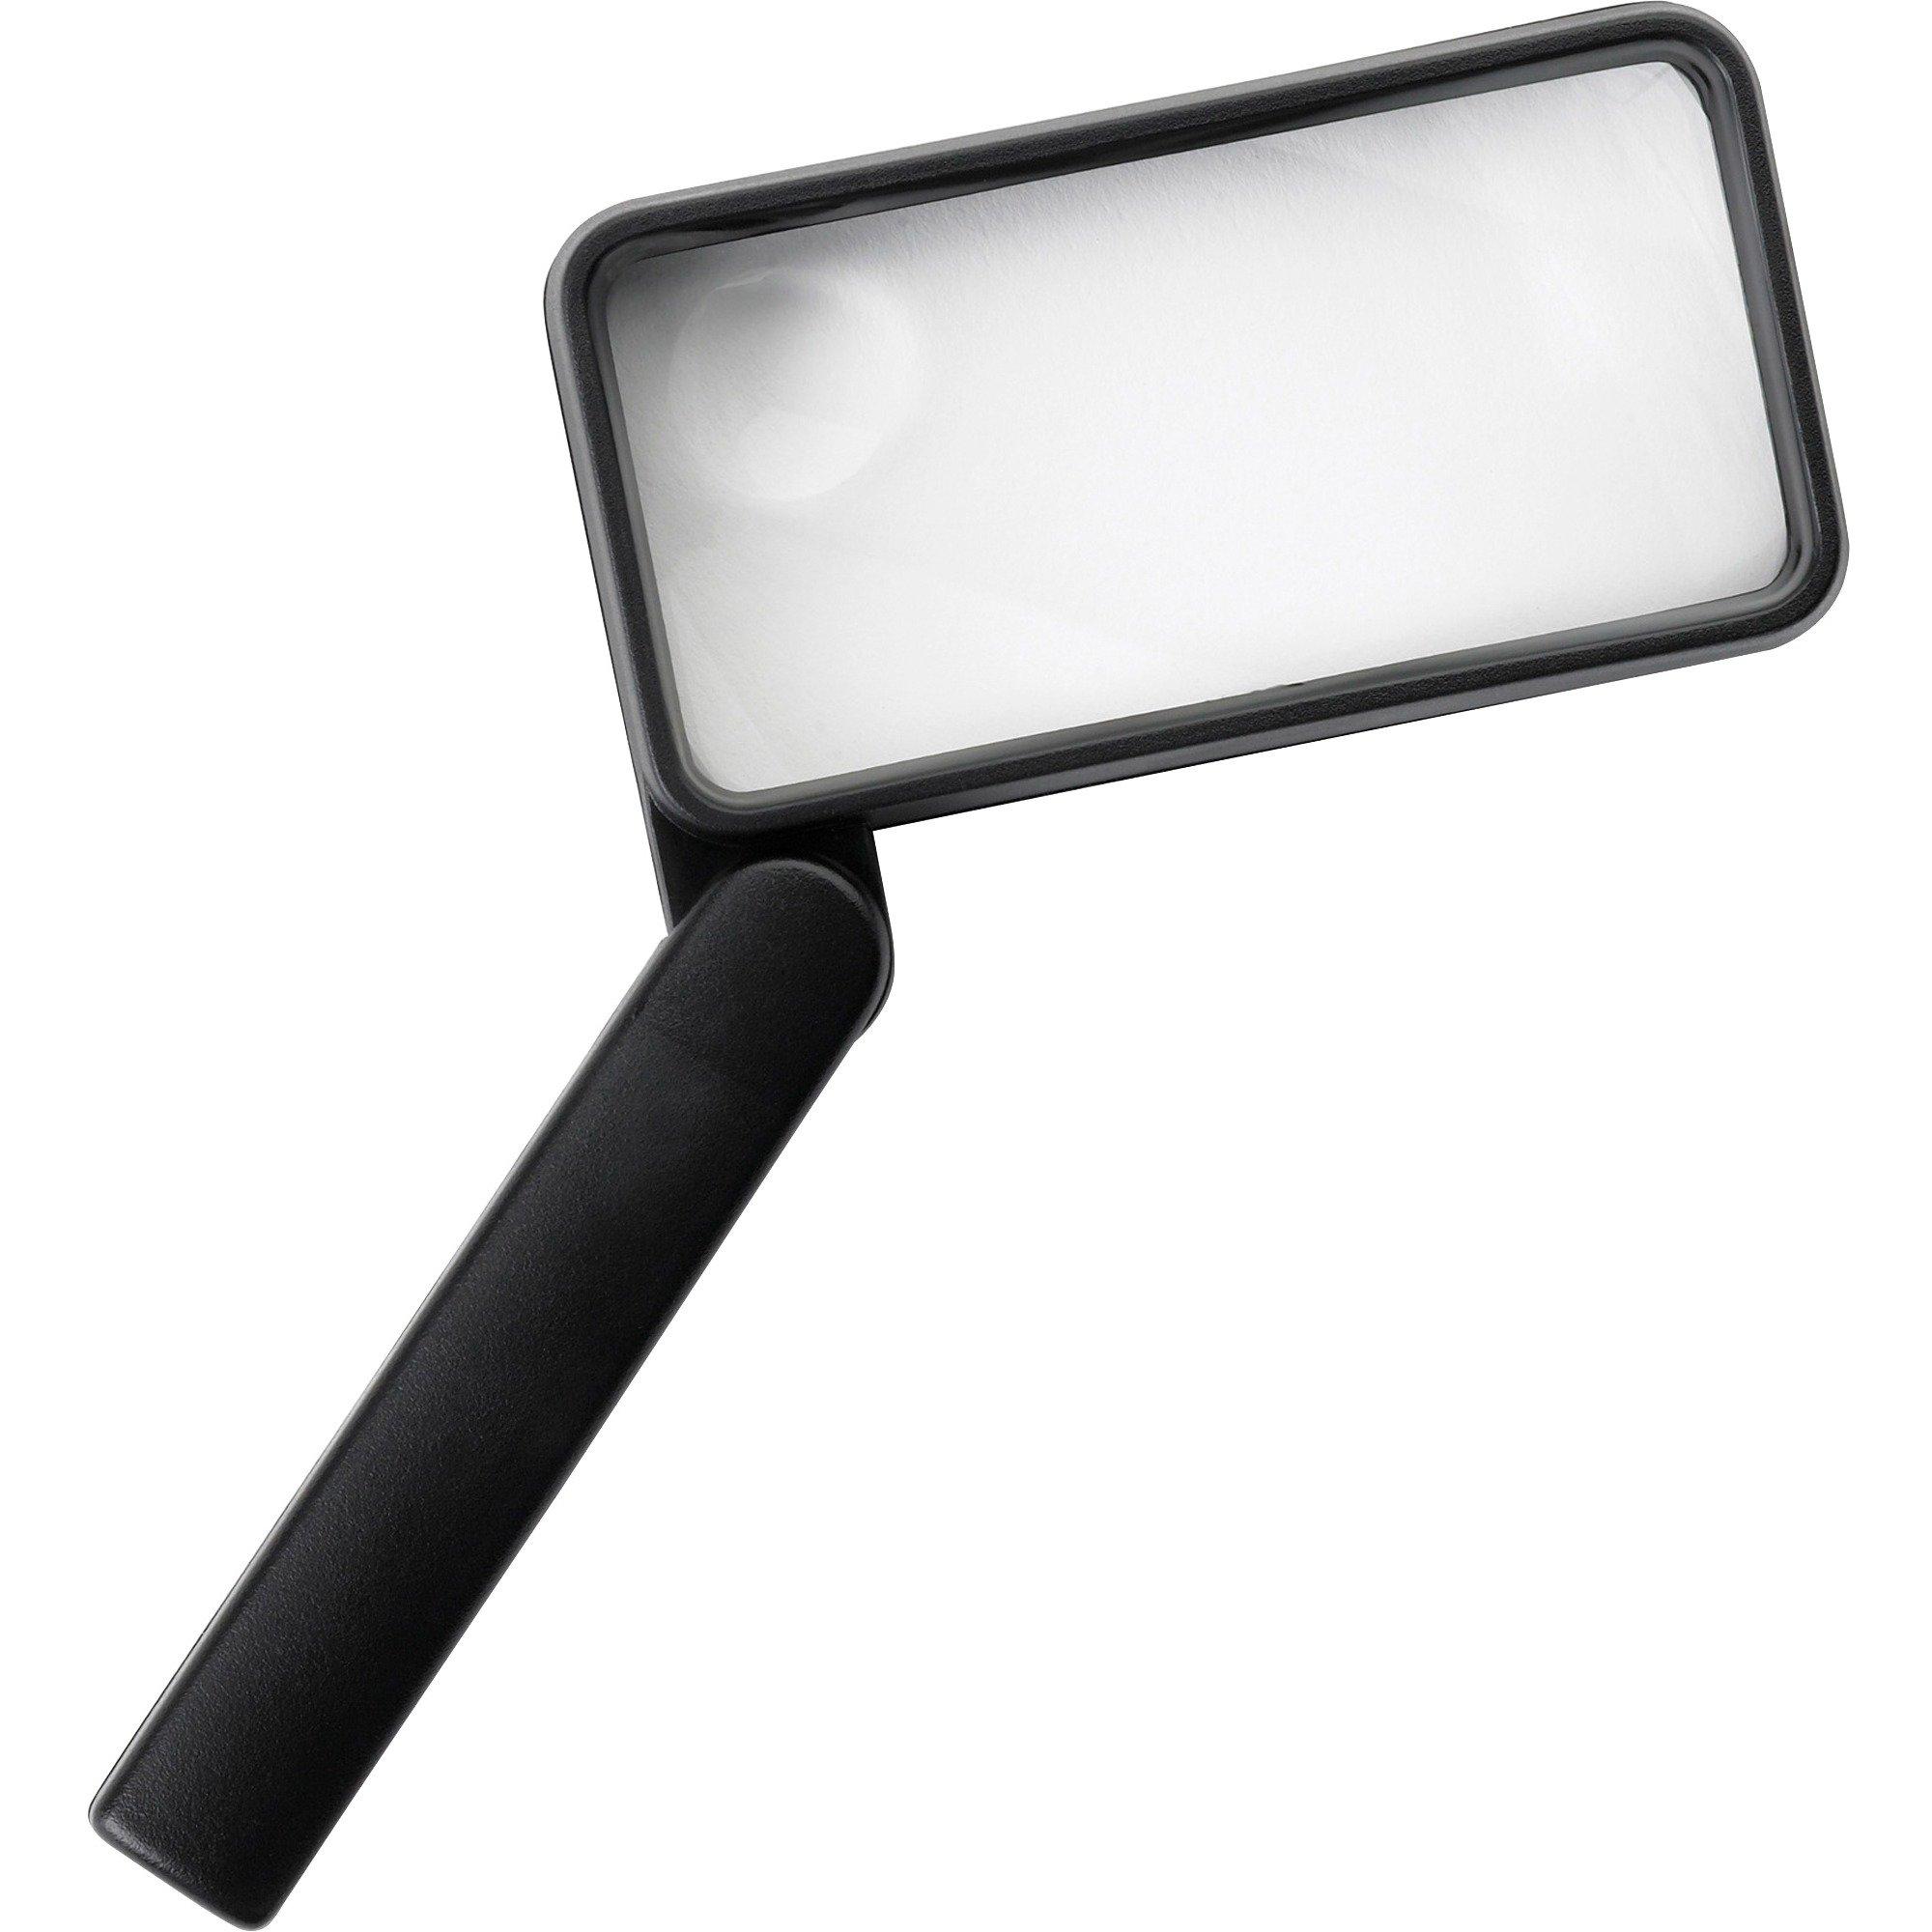 Sparco 01877 Rectangular Magnifier, 2X Main W/4X Bifocal, 2''x4'', Black